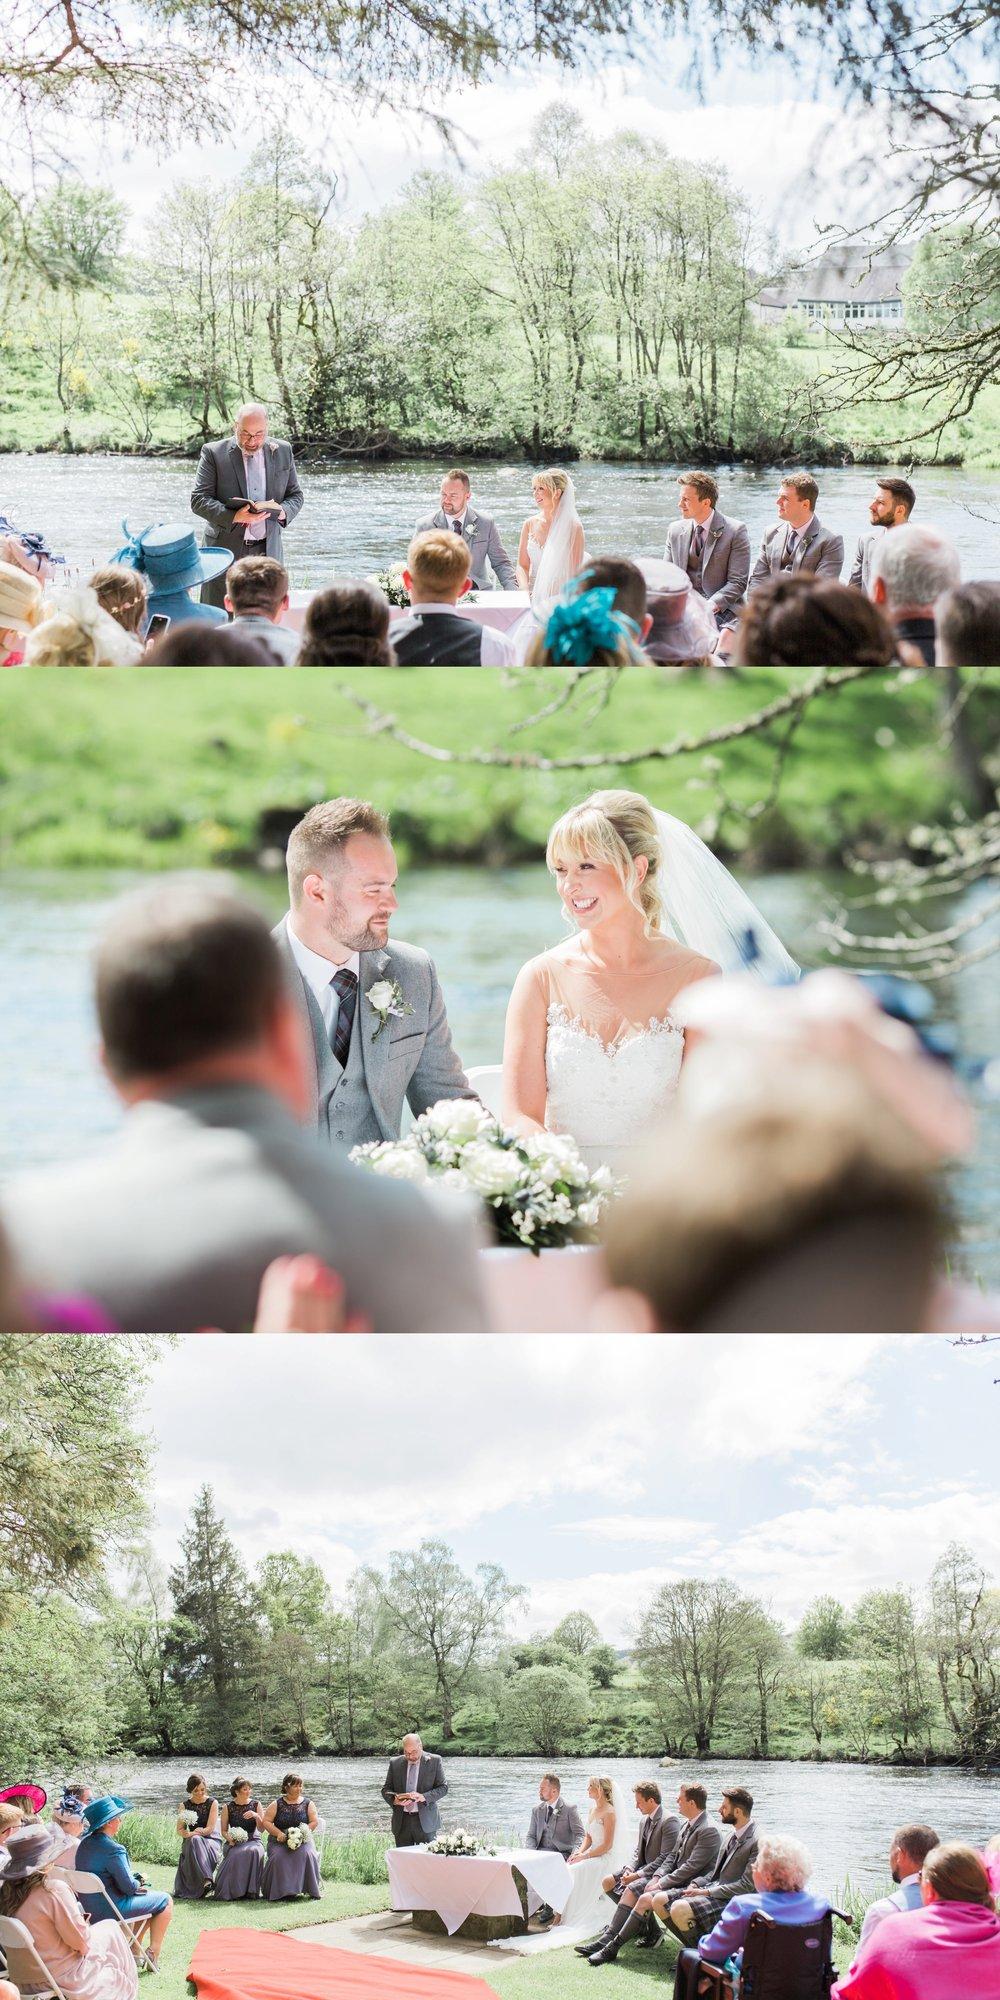 Suzanne_li_photography_Roman_camp_wedding_0012.jpg